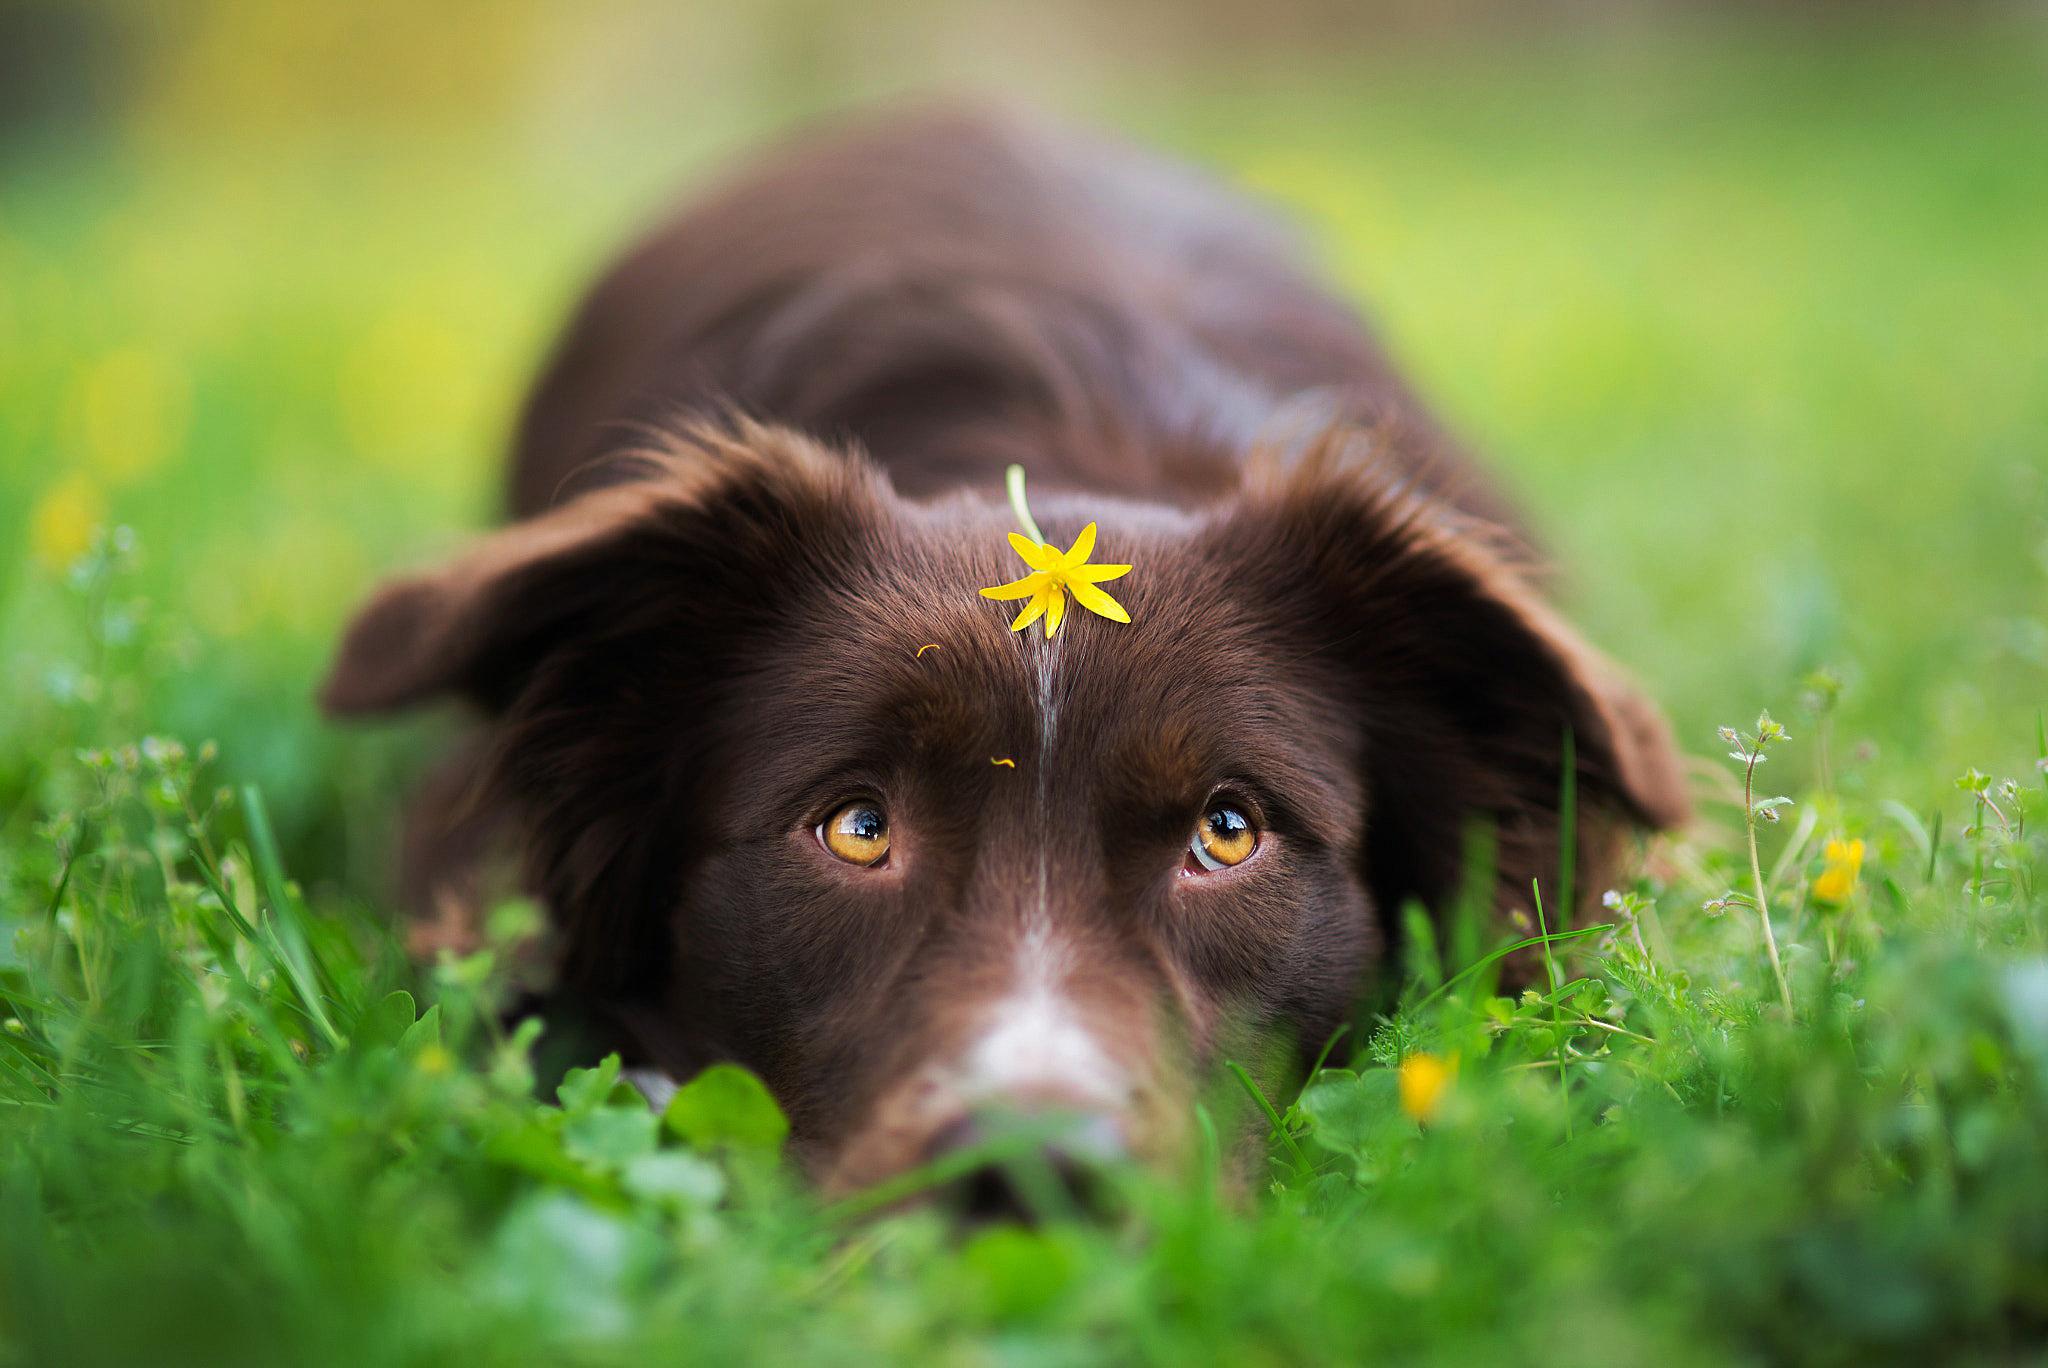 краснодаре, весна картинки с собаками ничто